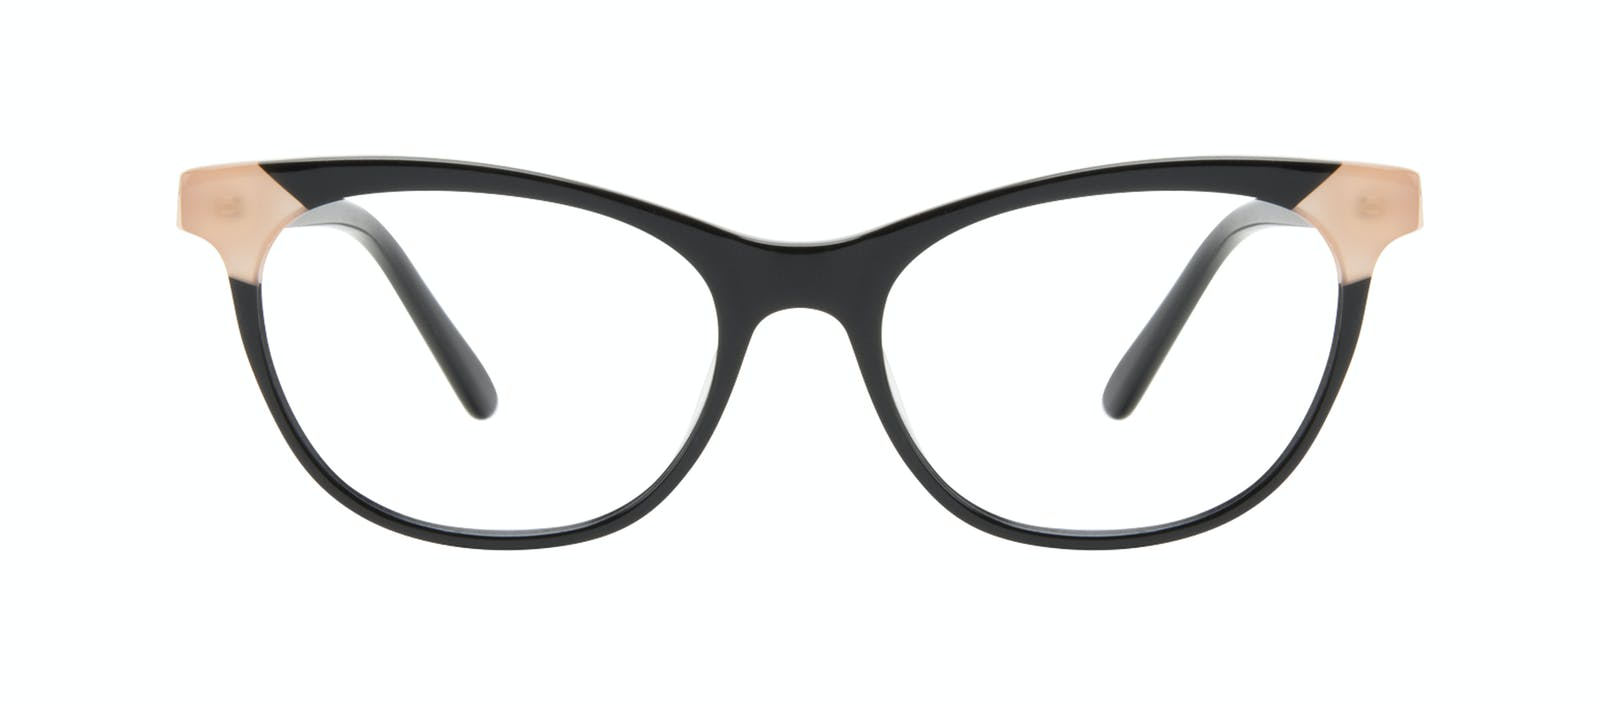 b3cf30e7f4 Affordable Fashion Glasses Cat Eye Eyeglasses Women Witty Black Ivory Front